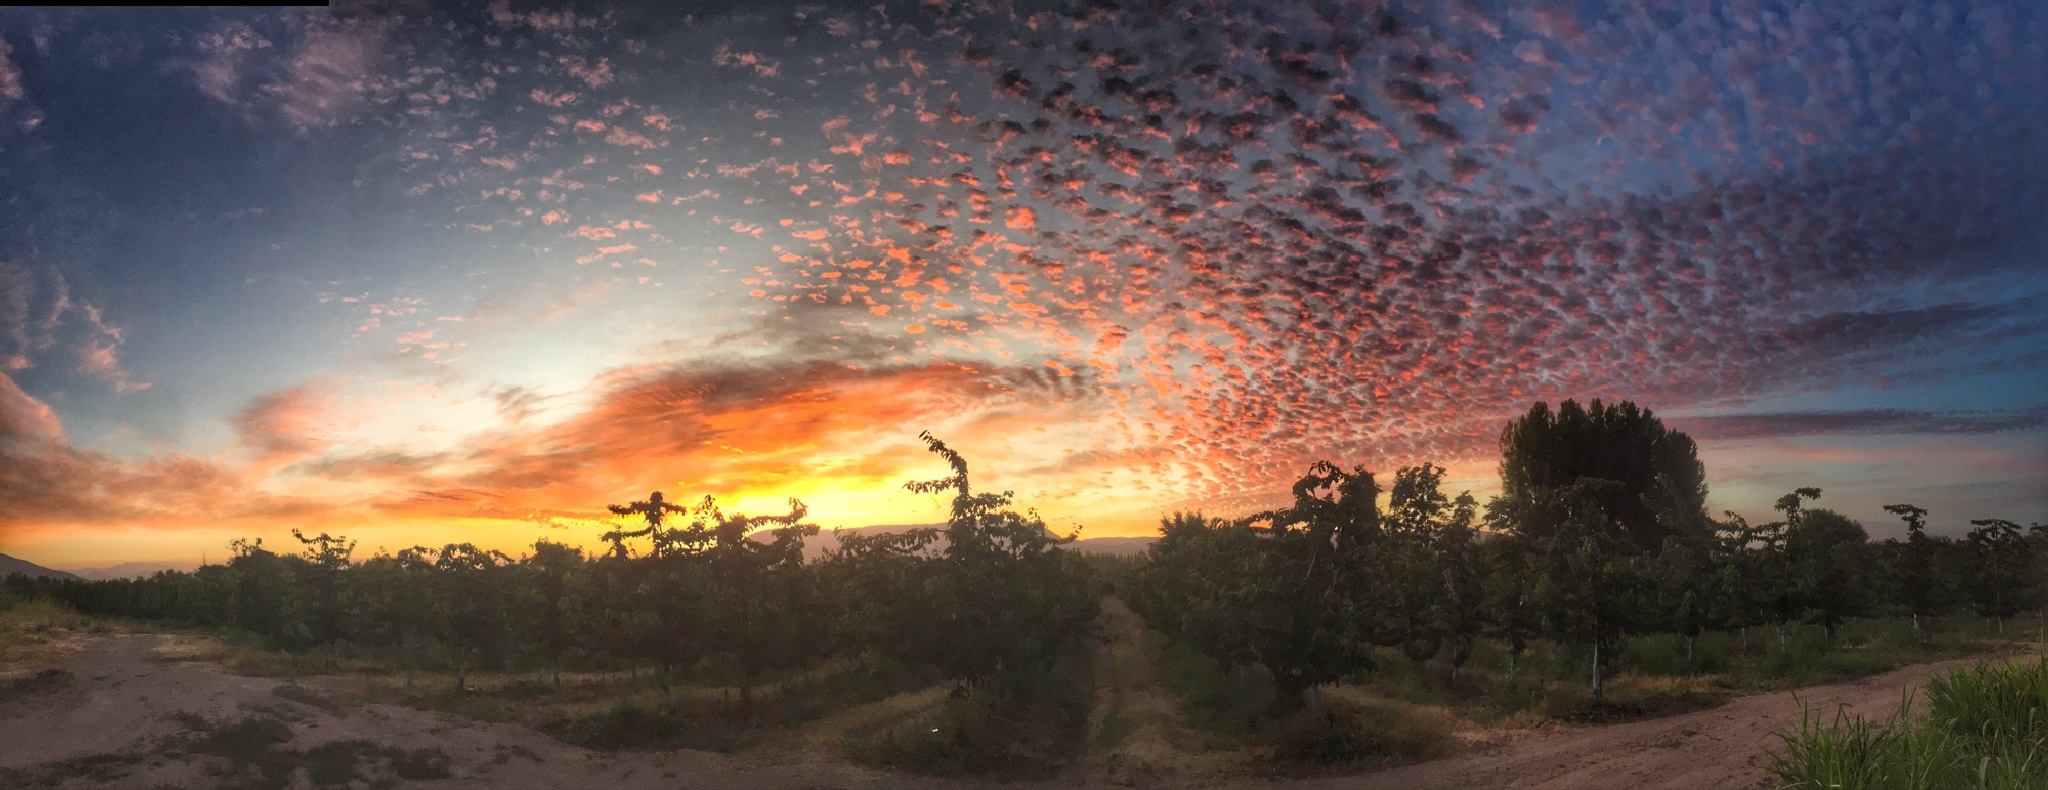 Sunrise by Liliana